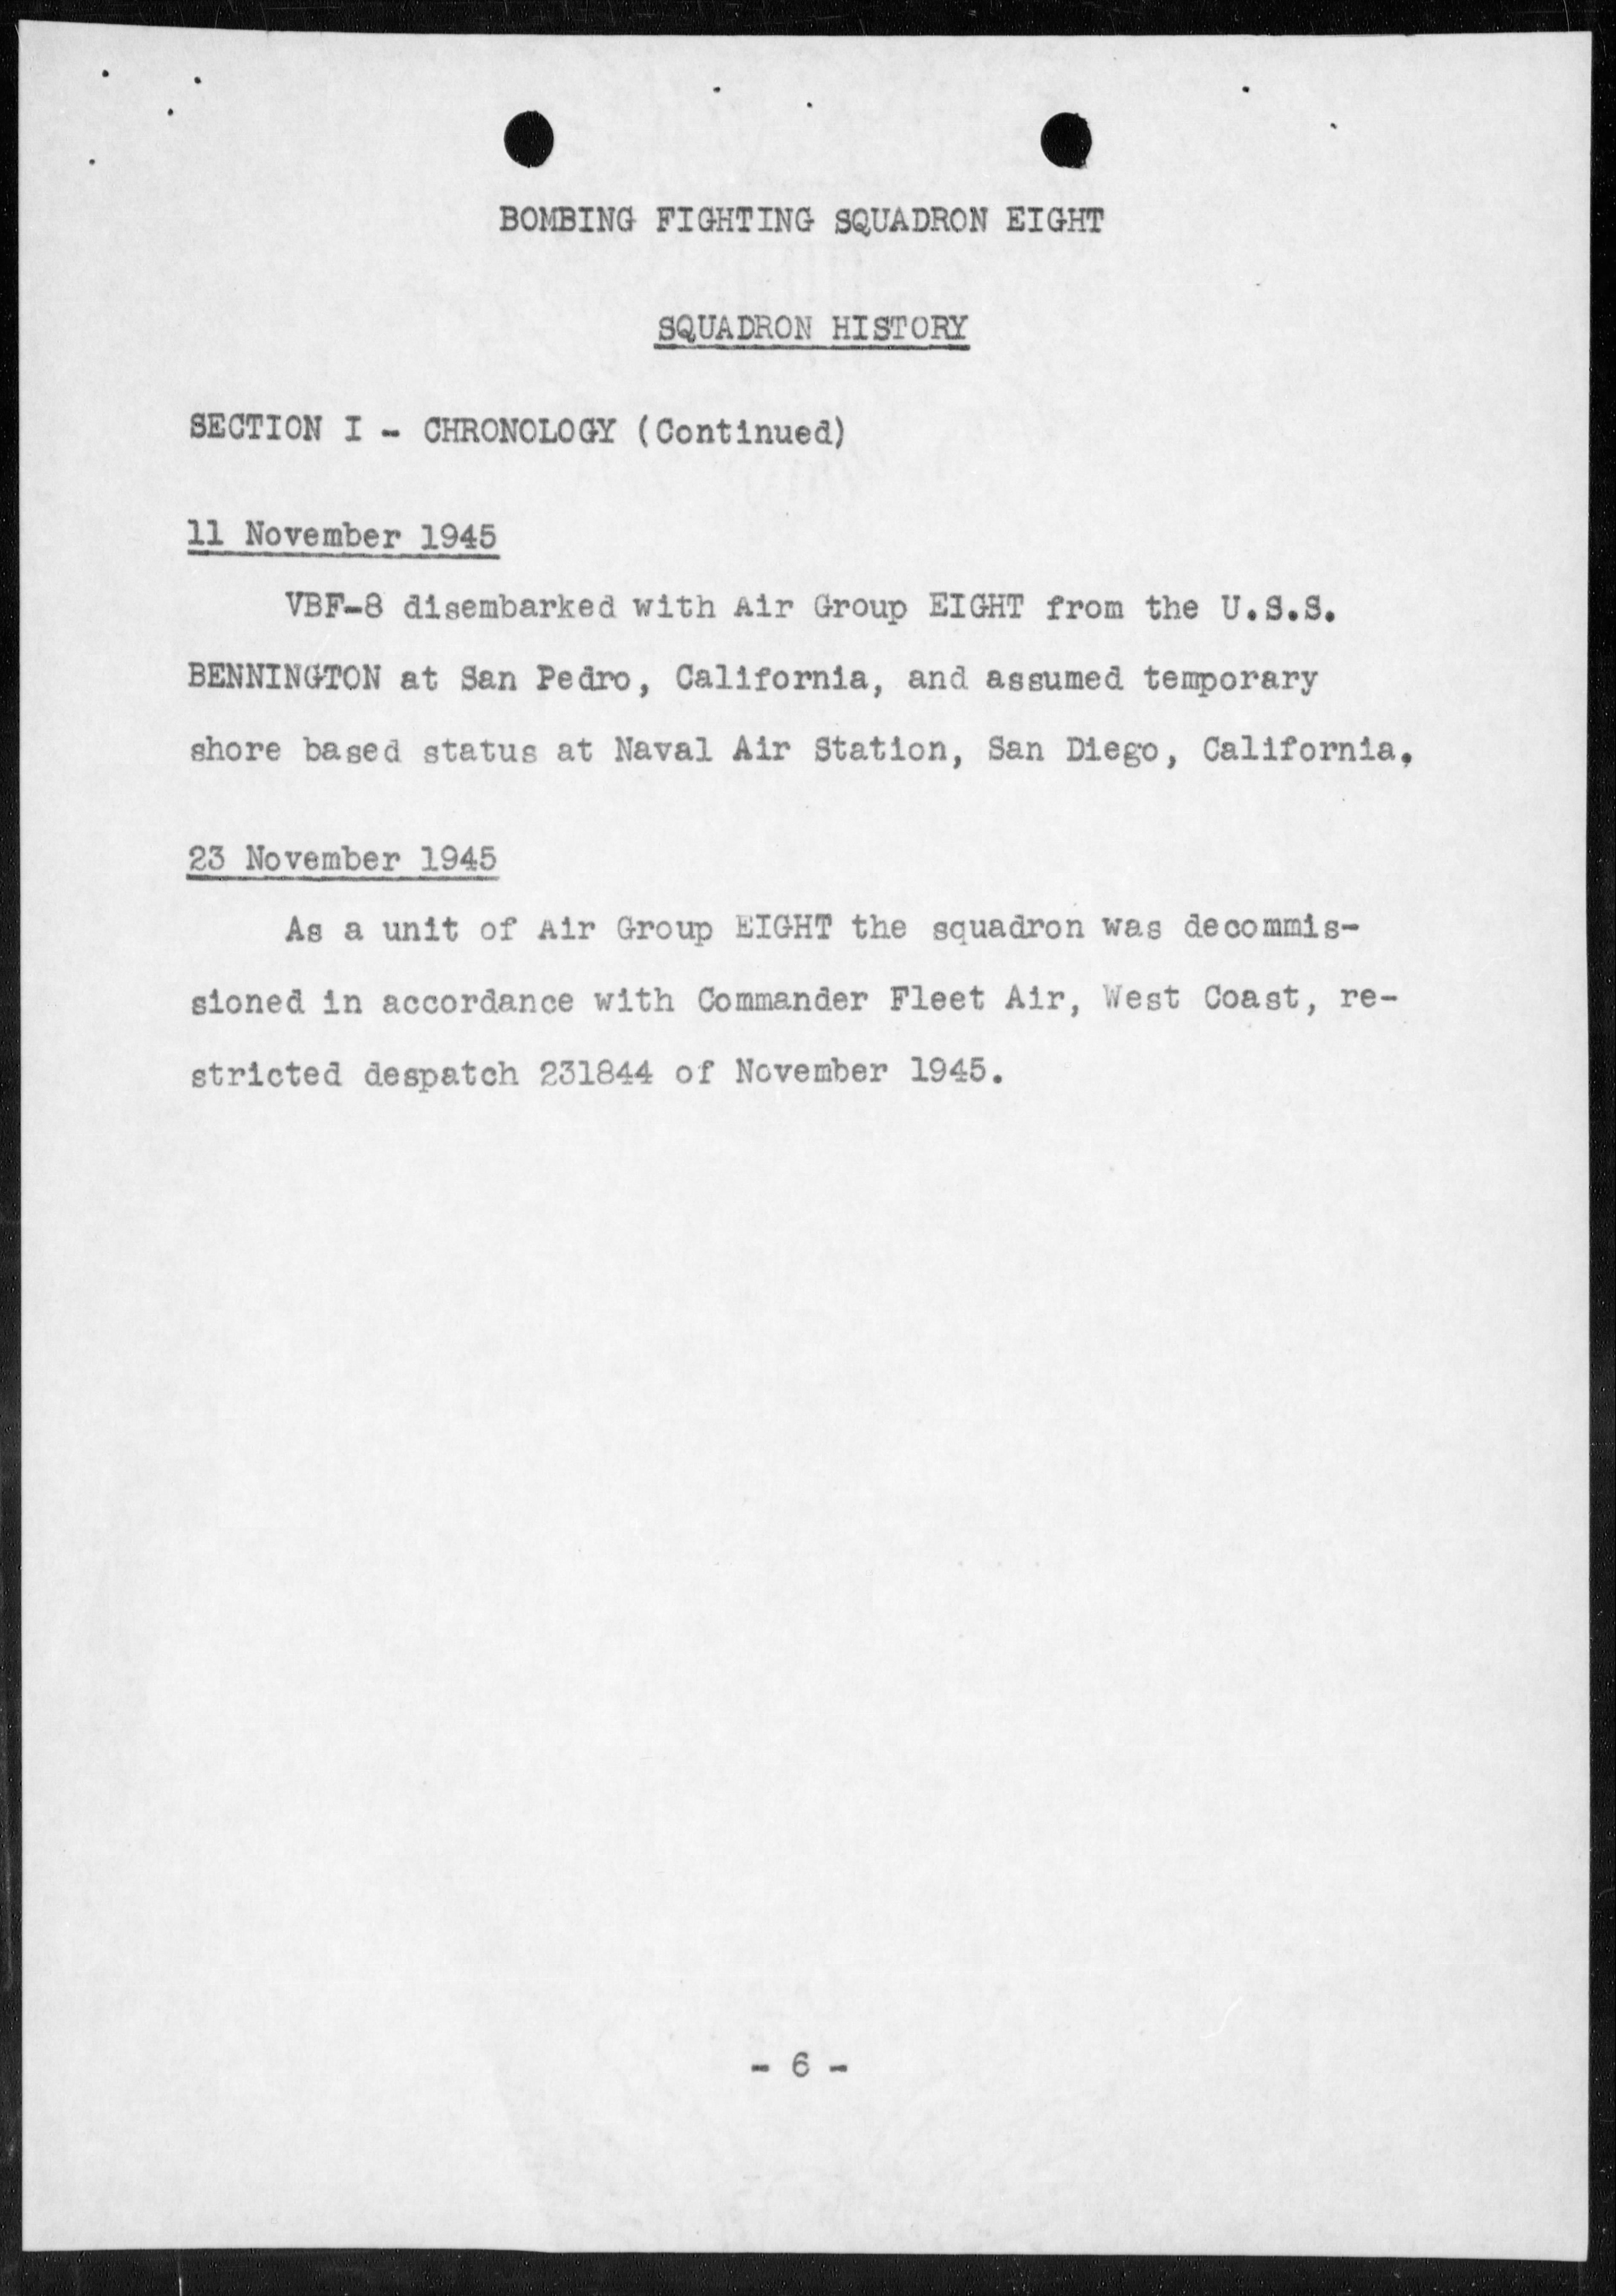 Document USN VBF 8 war diary 1945 0G